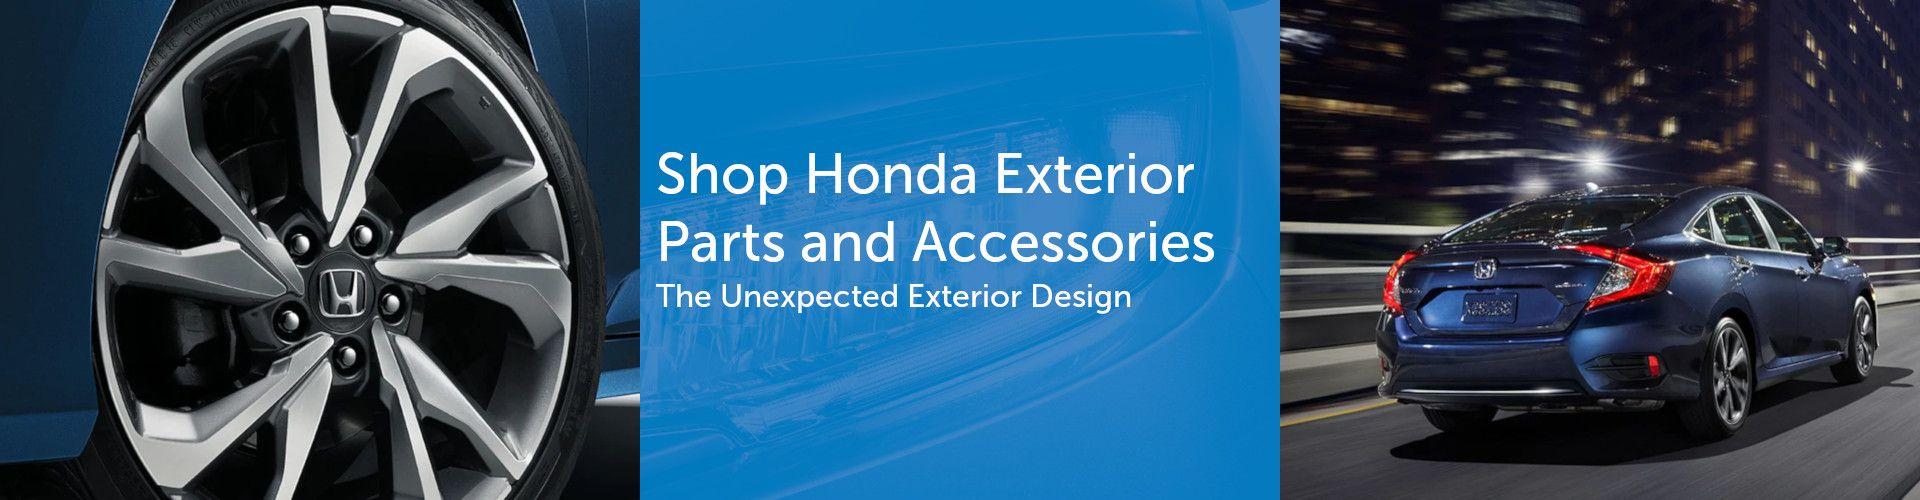 Honda Exterior Parts & Accessories